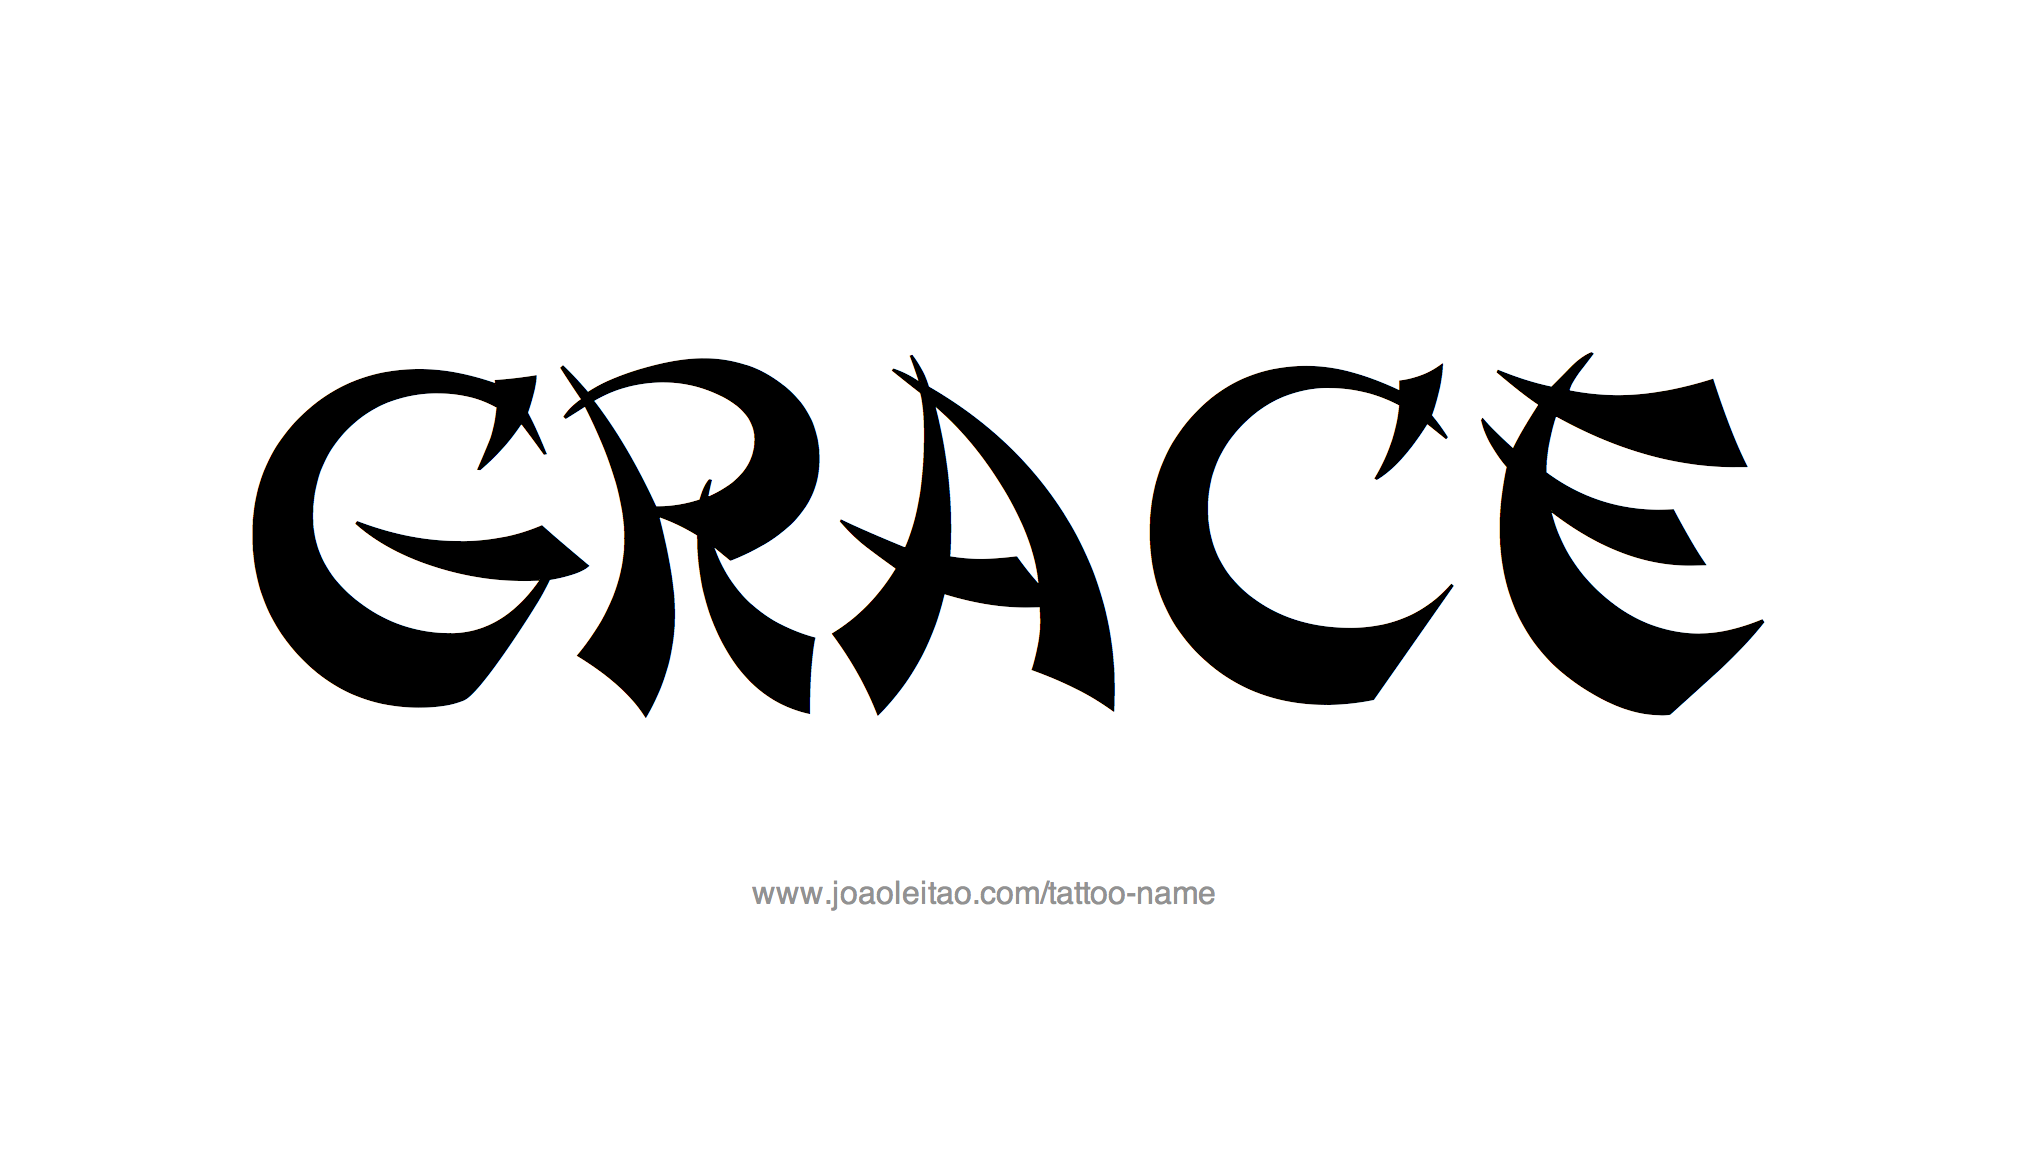 Grace Wrist Tattoo Designs Tattoo Design Name Grace Faith Tattoo Tattoo Designs Name Tattoos